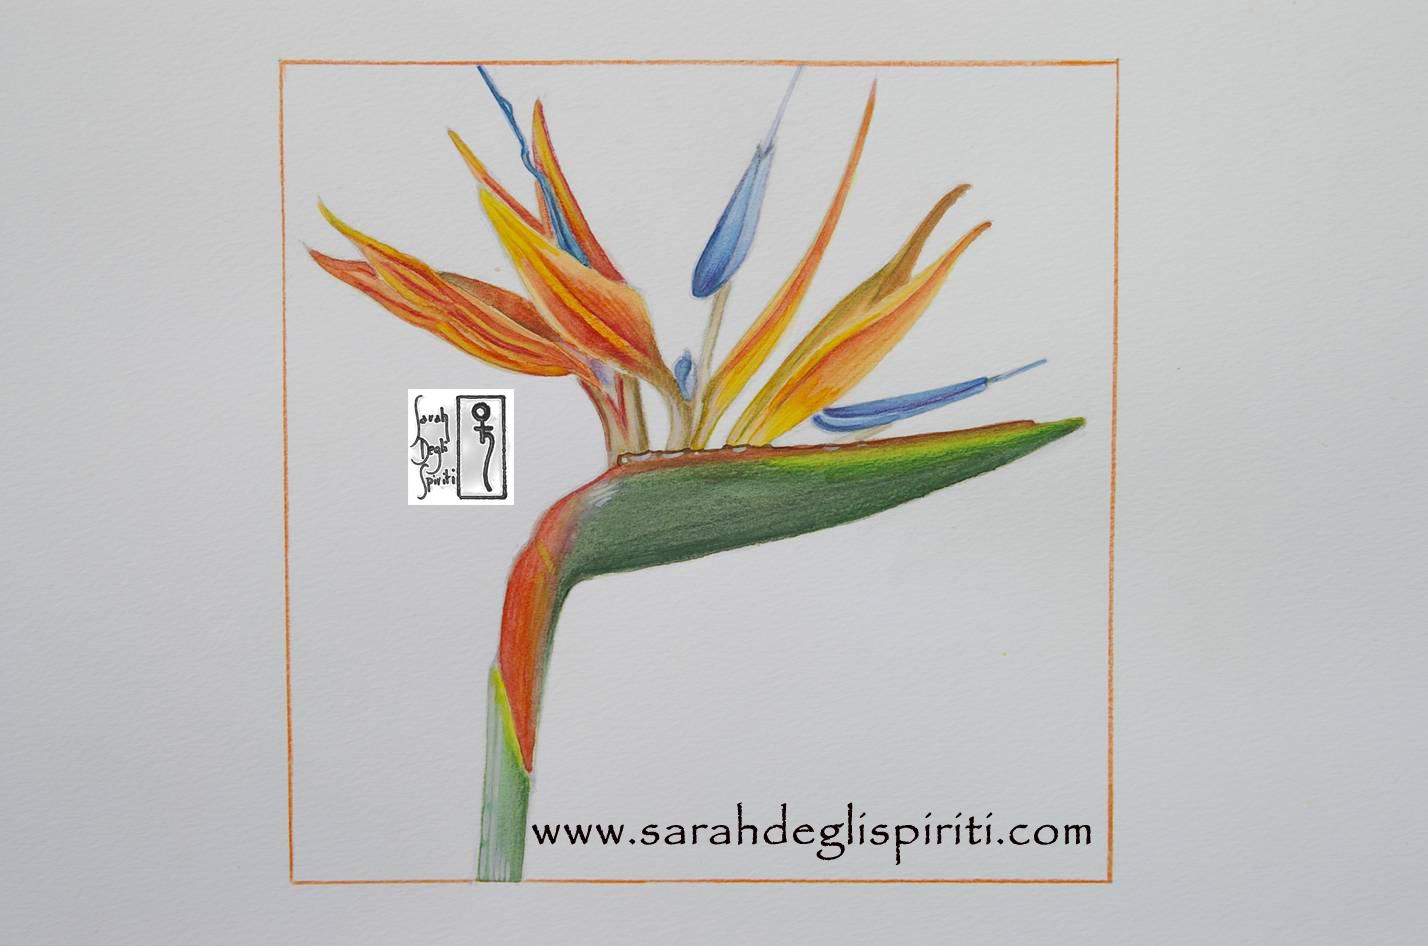 Fiore n.1